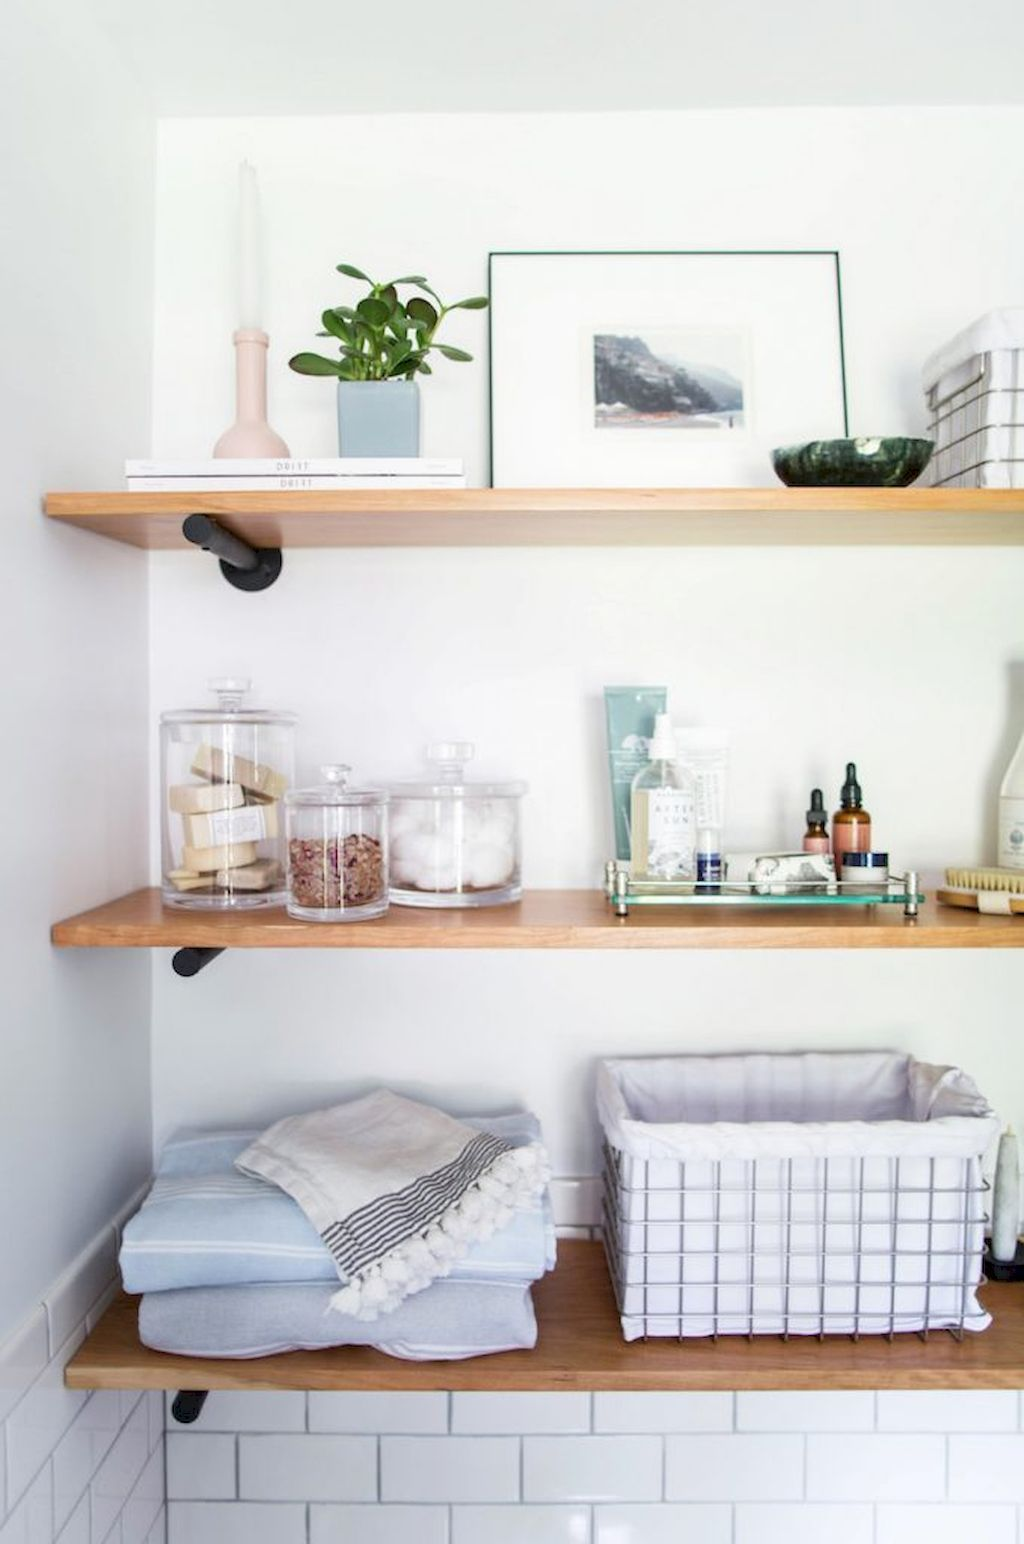 Stunning 30 Rustic Bathroom Shelves Storage Ideas https ...